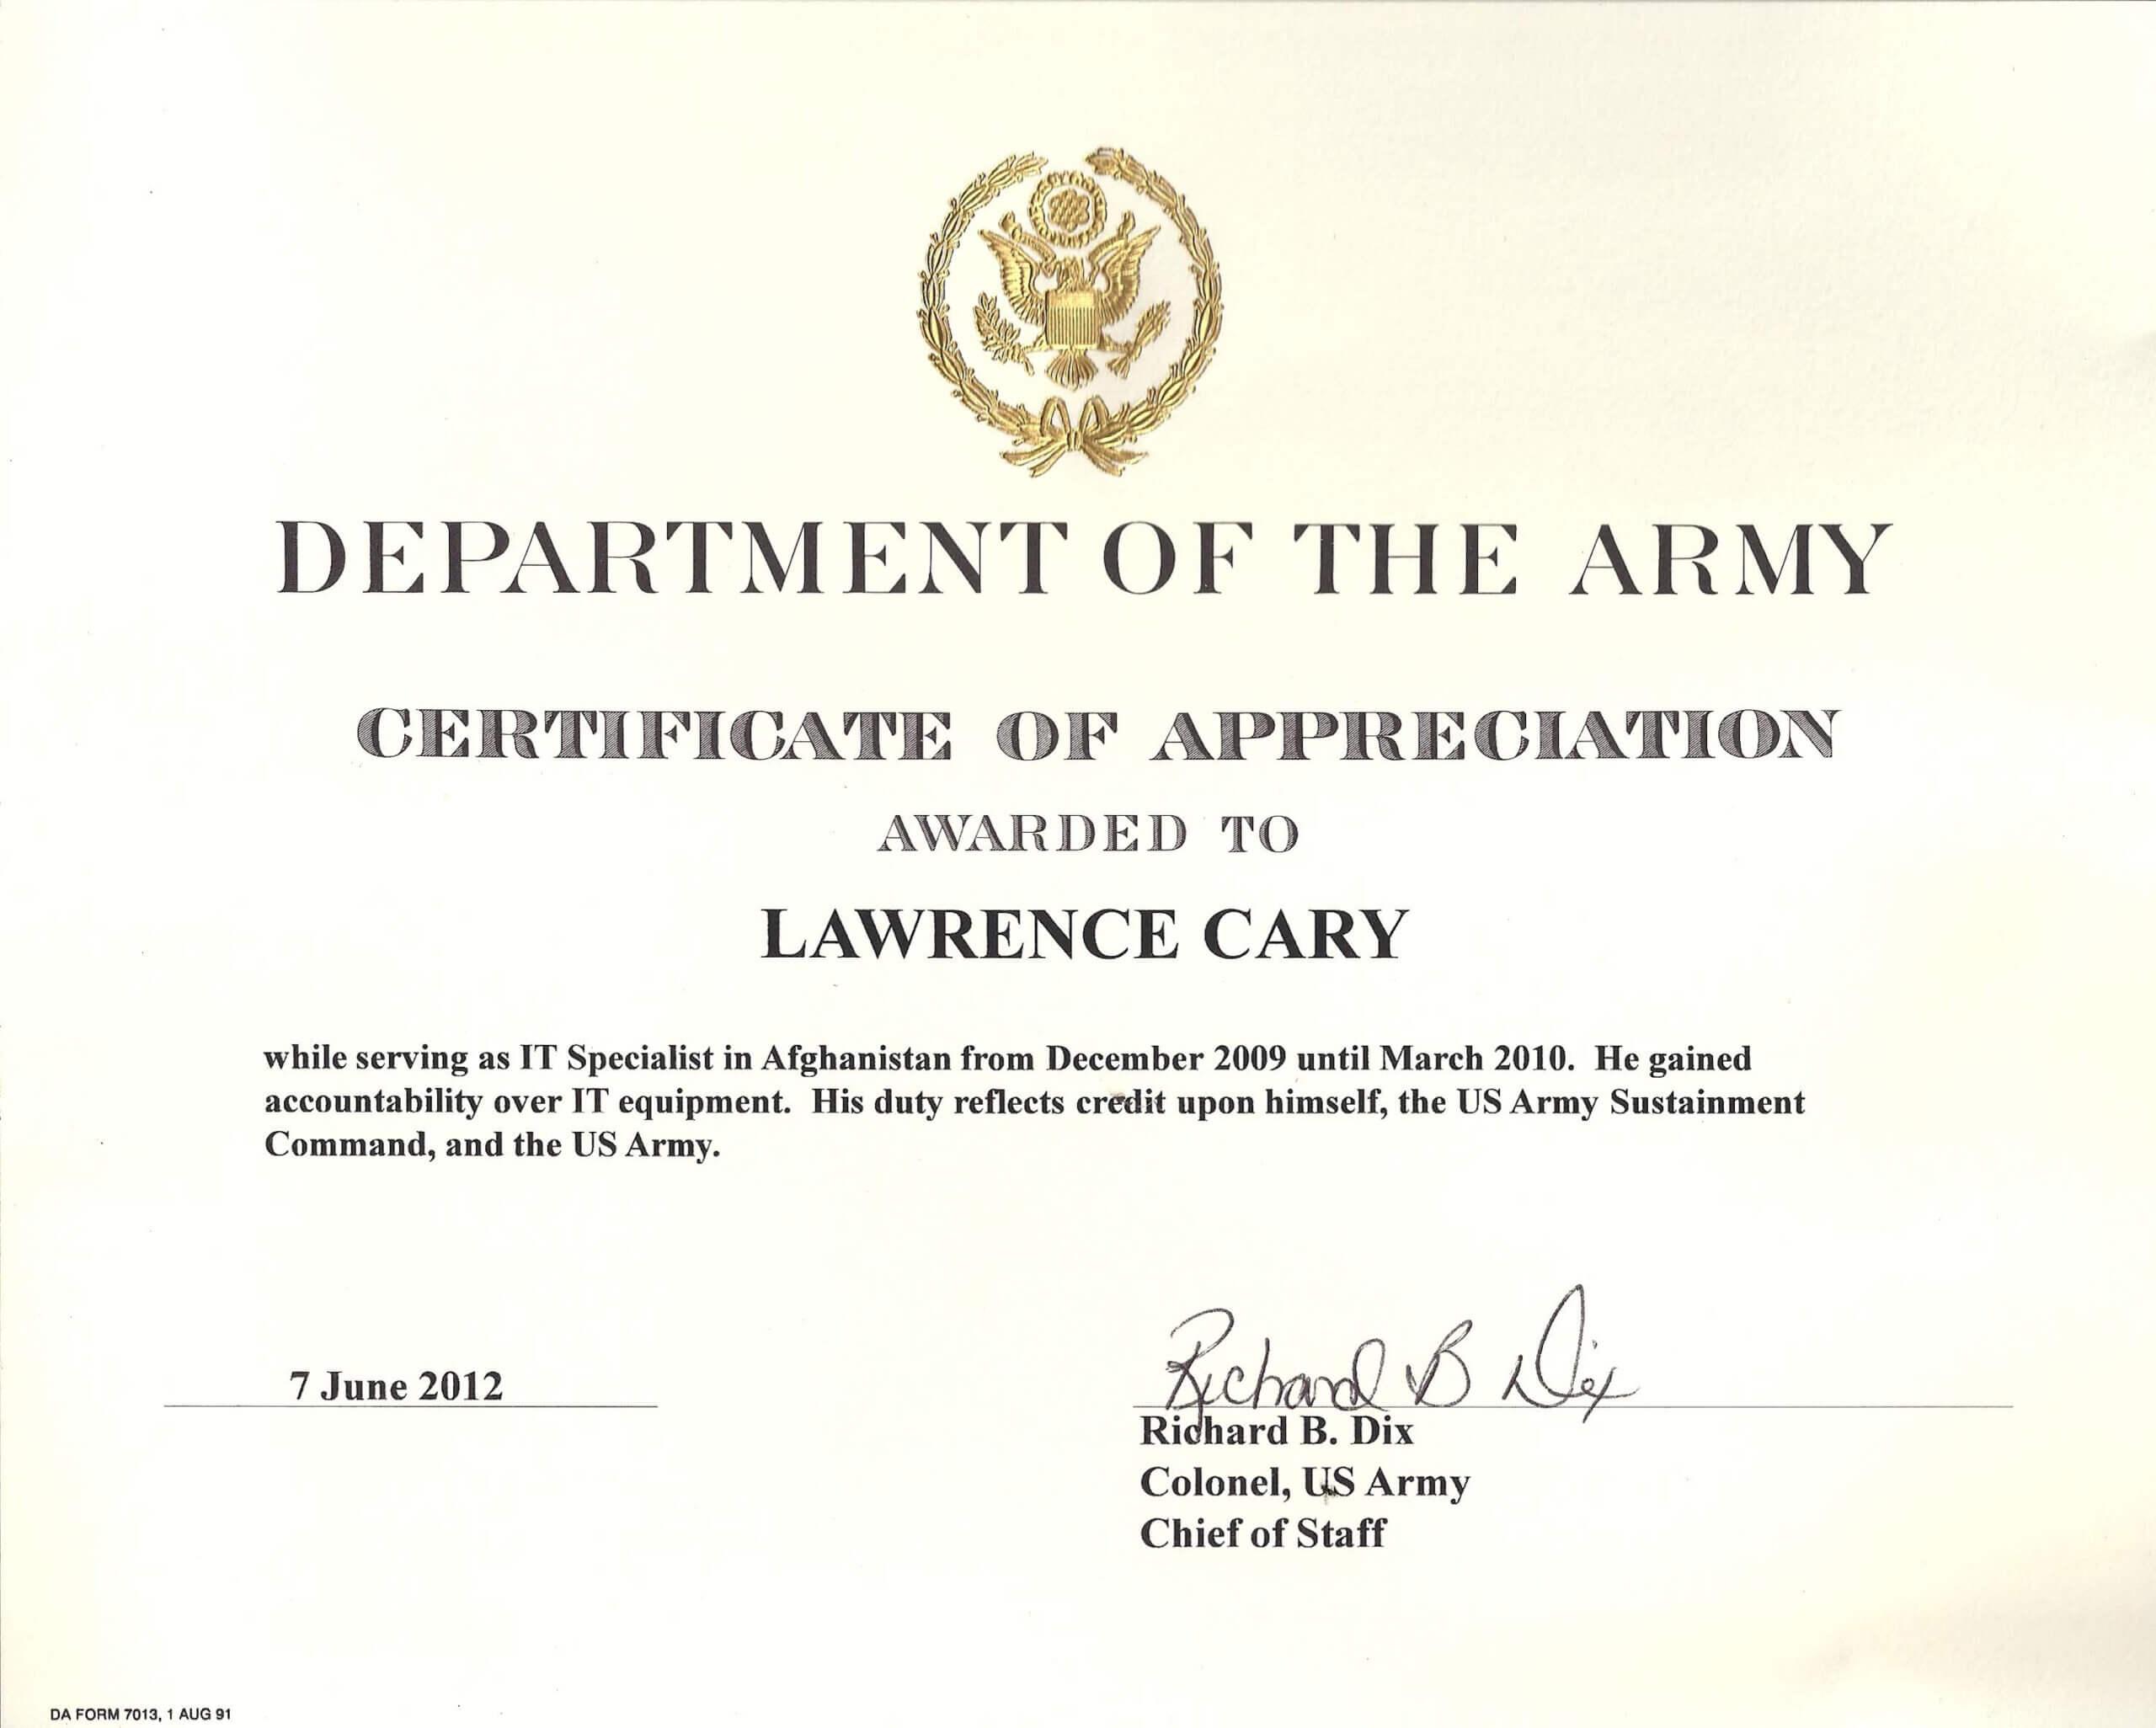 6+ Army Appreciation Certificate Templates - Pdf, Docx Regarding Army Certificate Of Appreciation Template